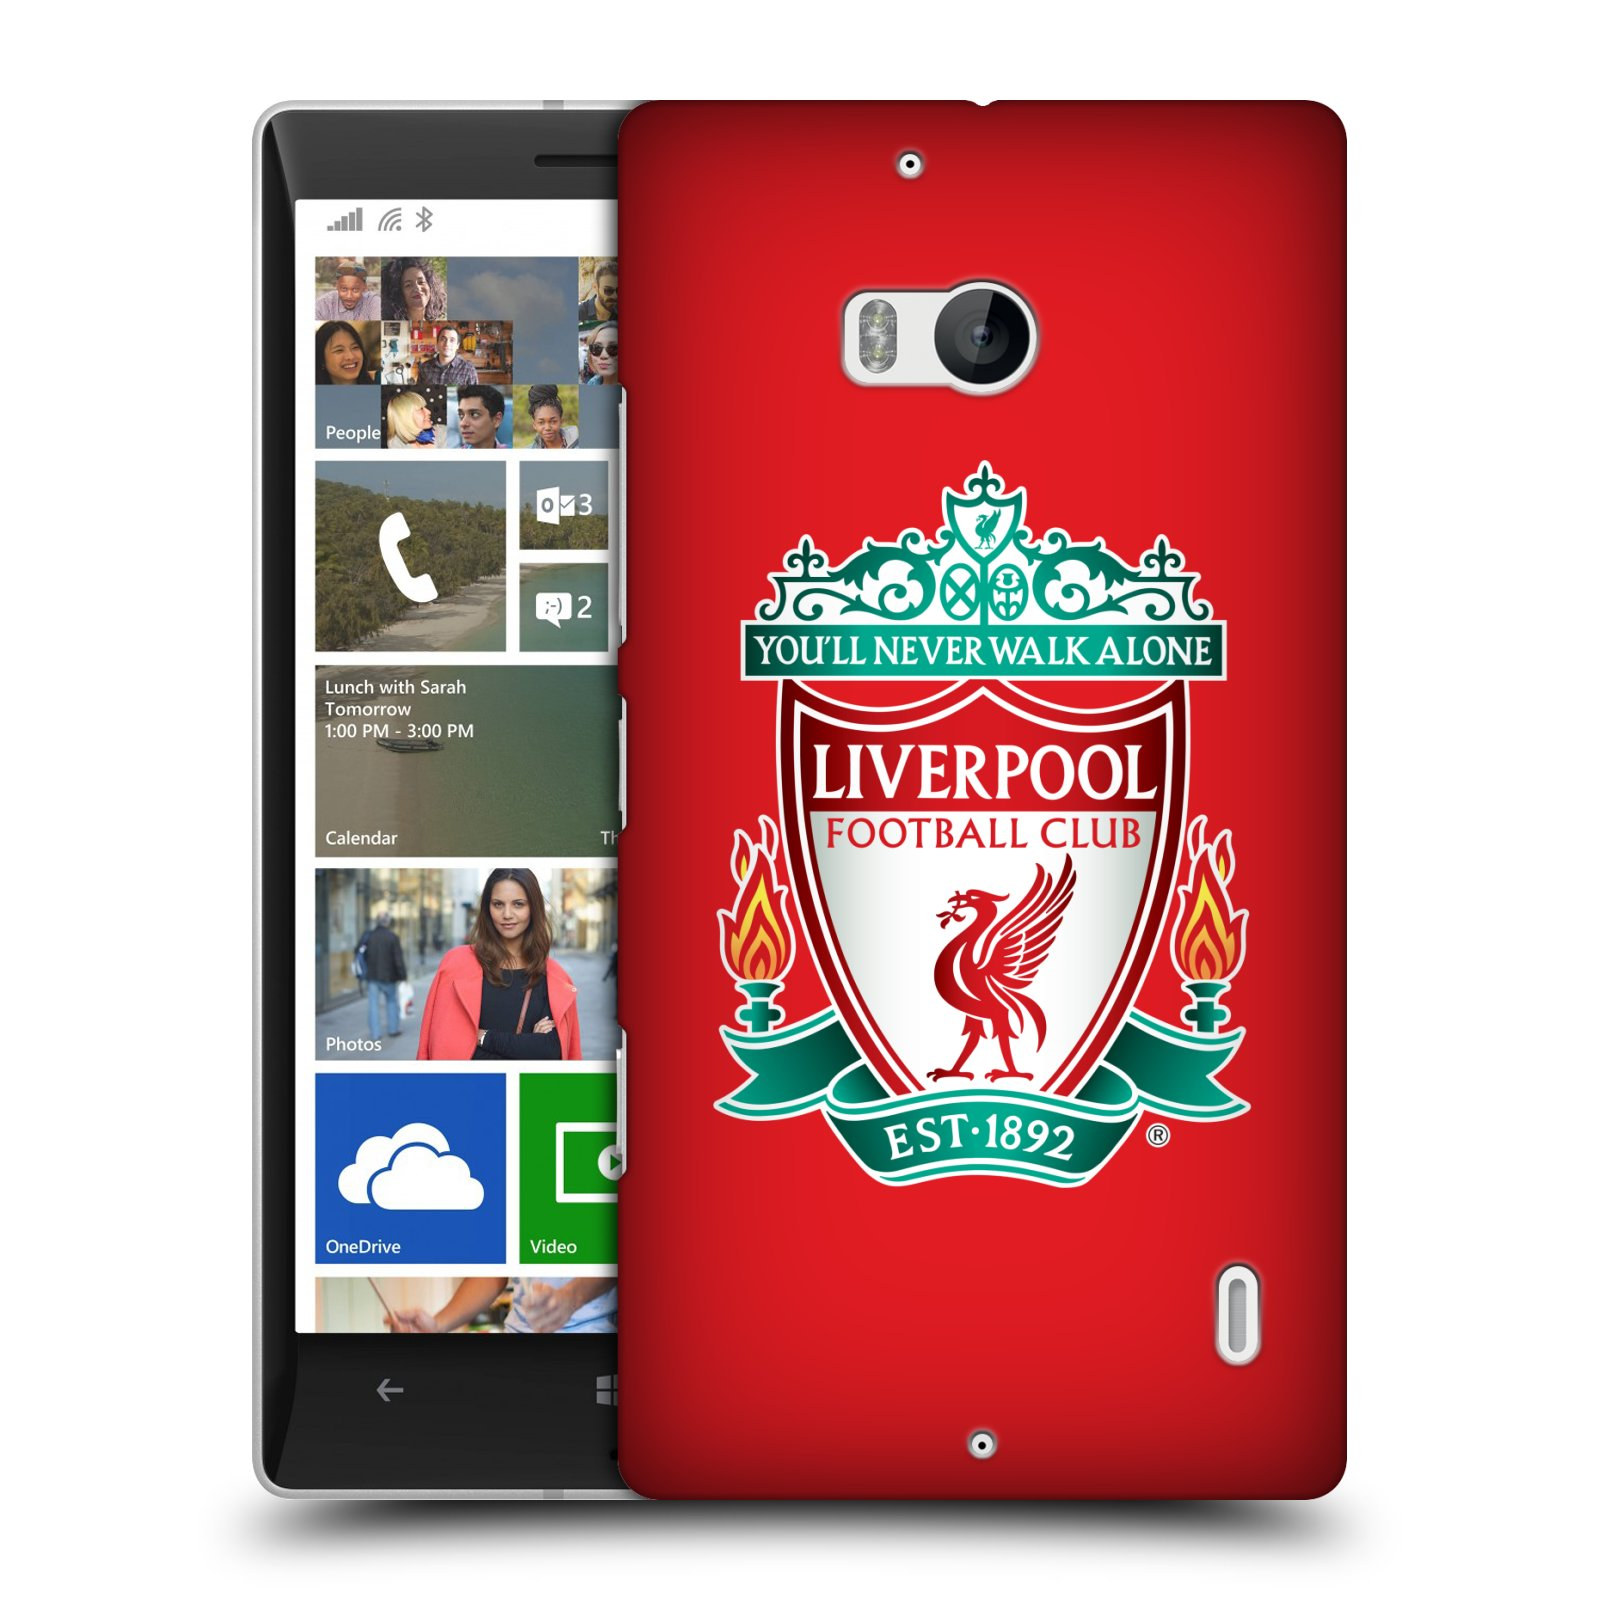 Plastové pouzdro na mobil Nokia Lumia 930 HEAD CASE ZNAK LIVERPOOL FC OFFICIAL RED (Kryt či obal na mobilní telefon Liverpool FC Official pro Nokia Lumia 930)